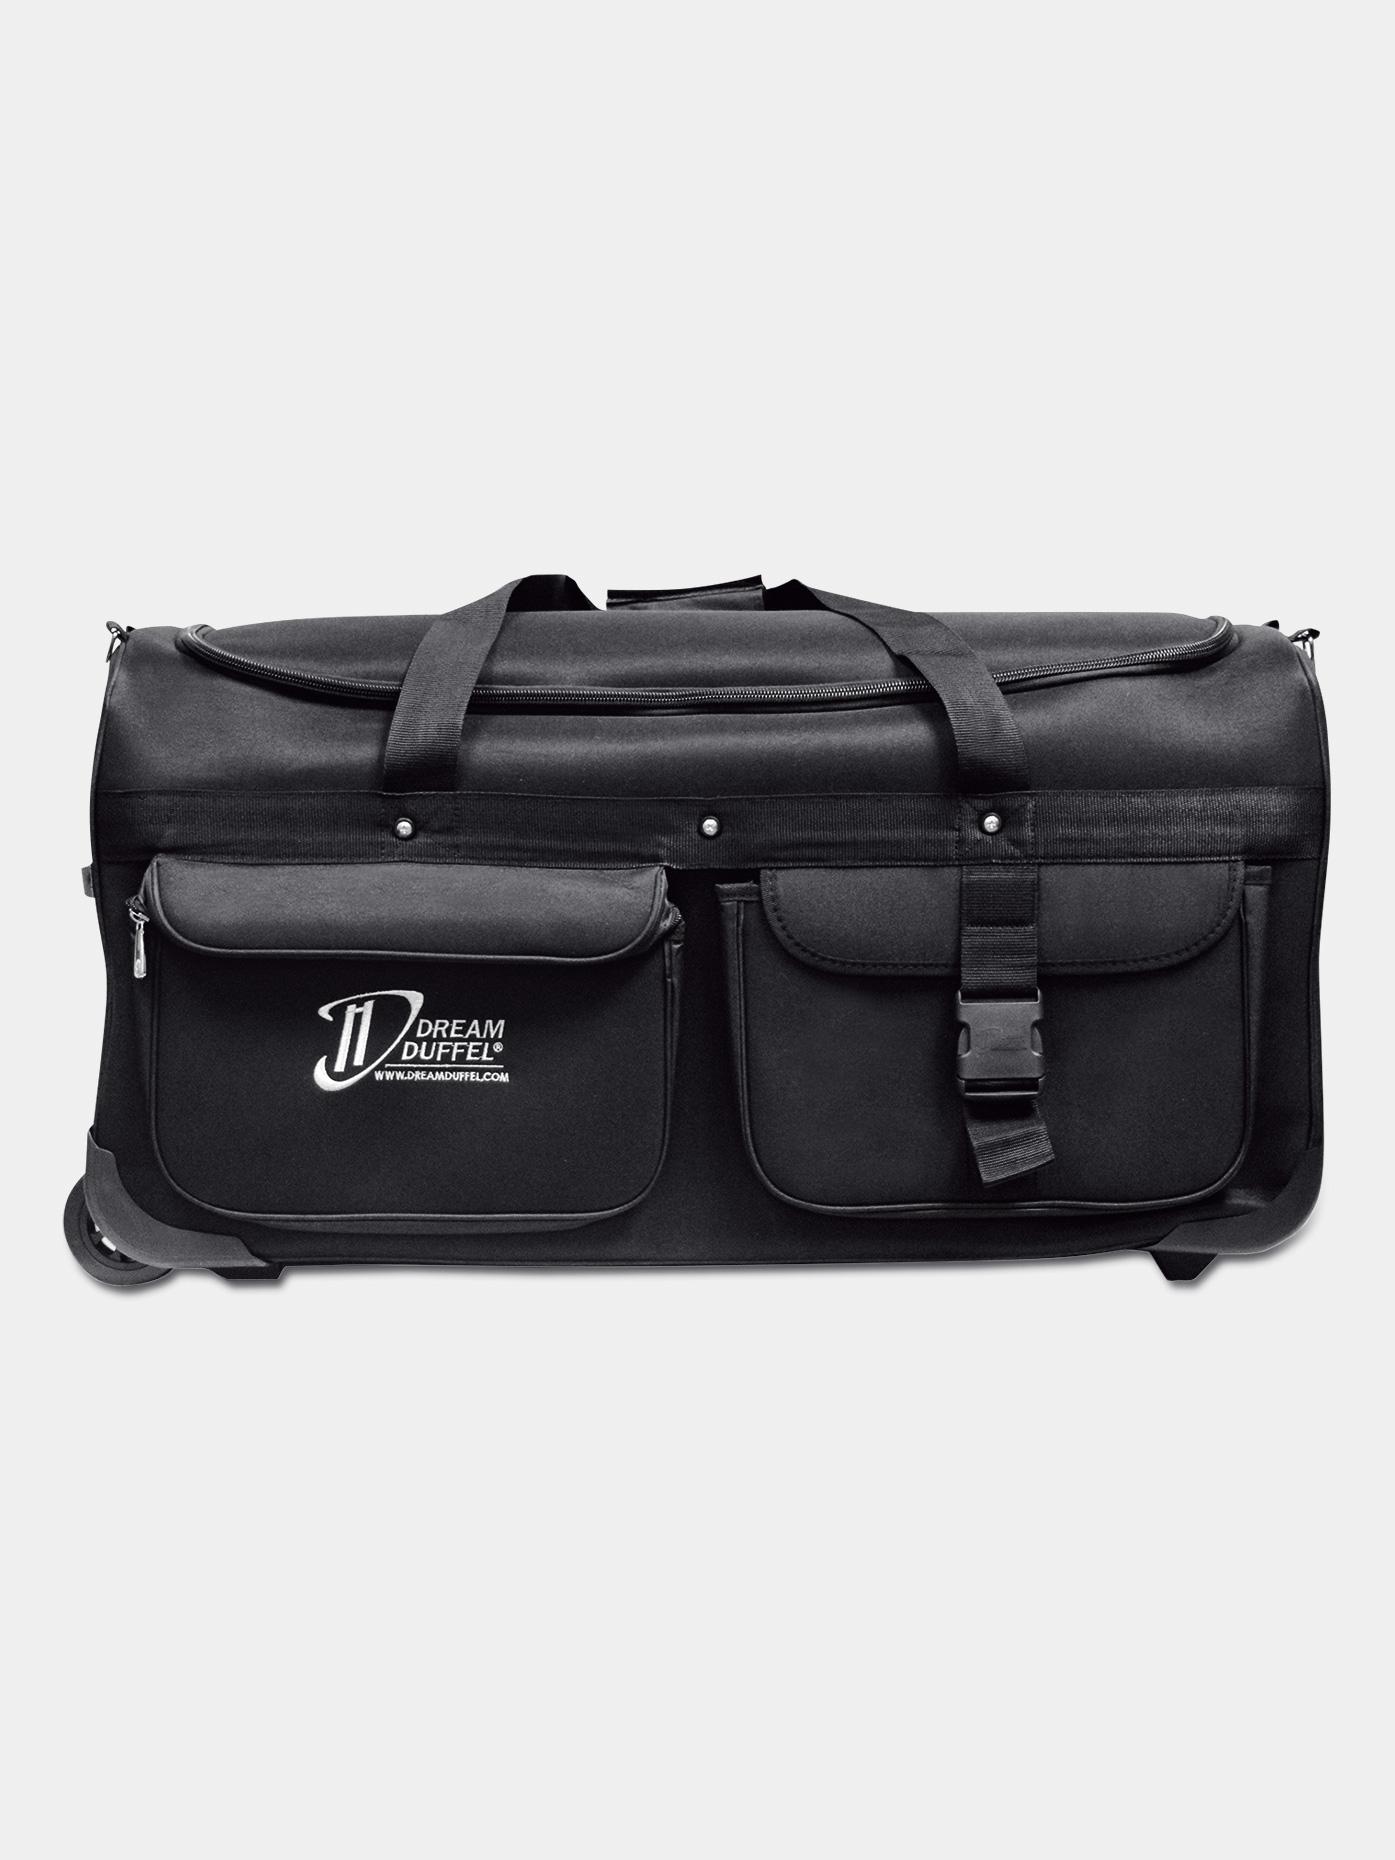 Dream Duffel Large Black Bag D1000